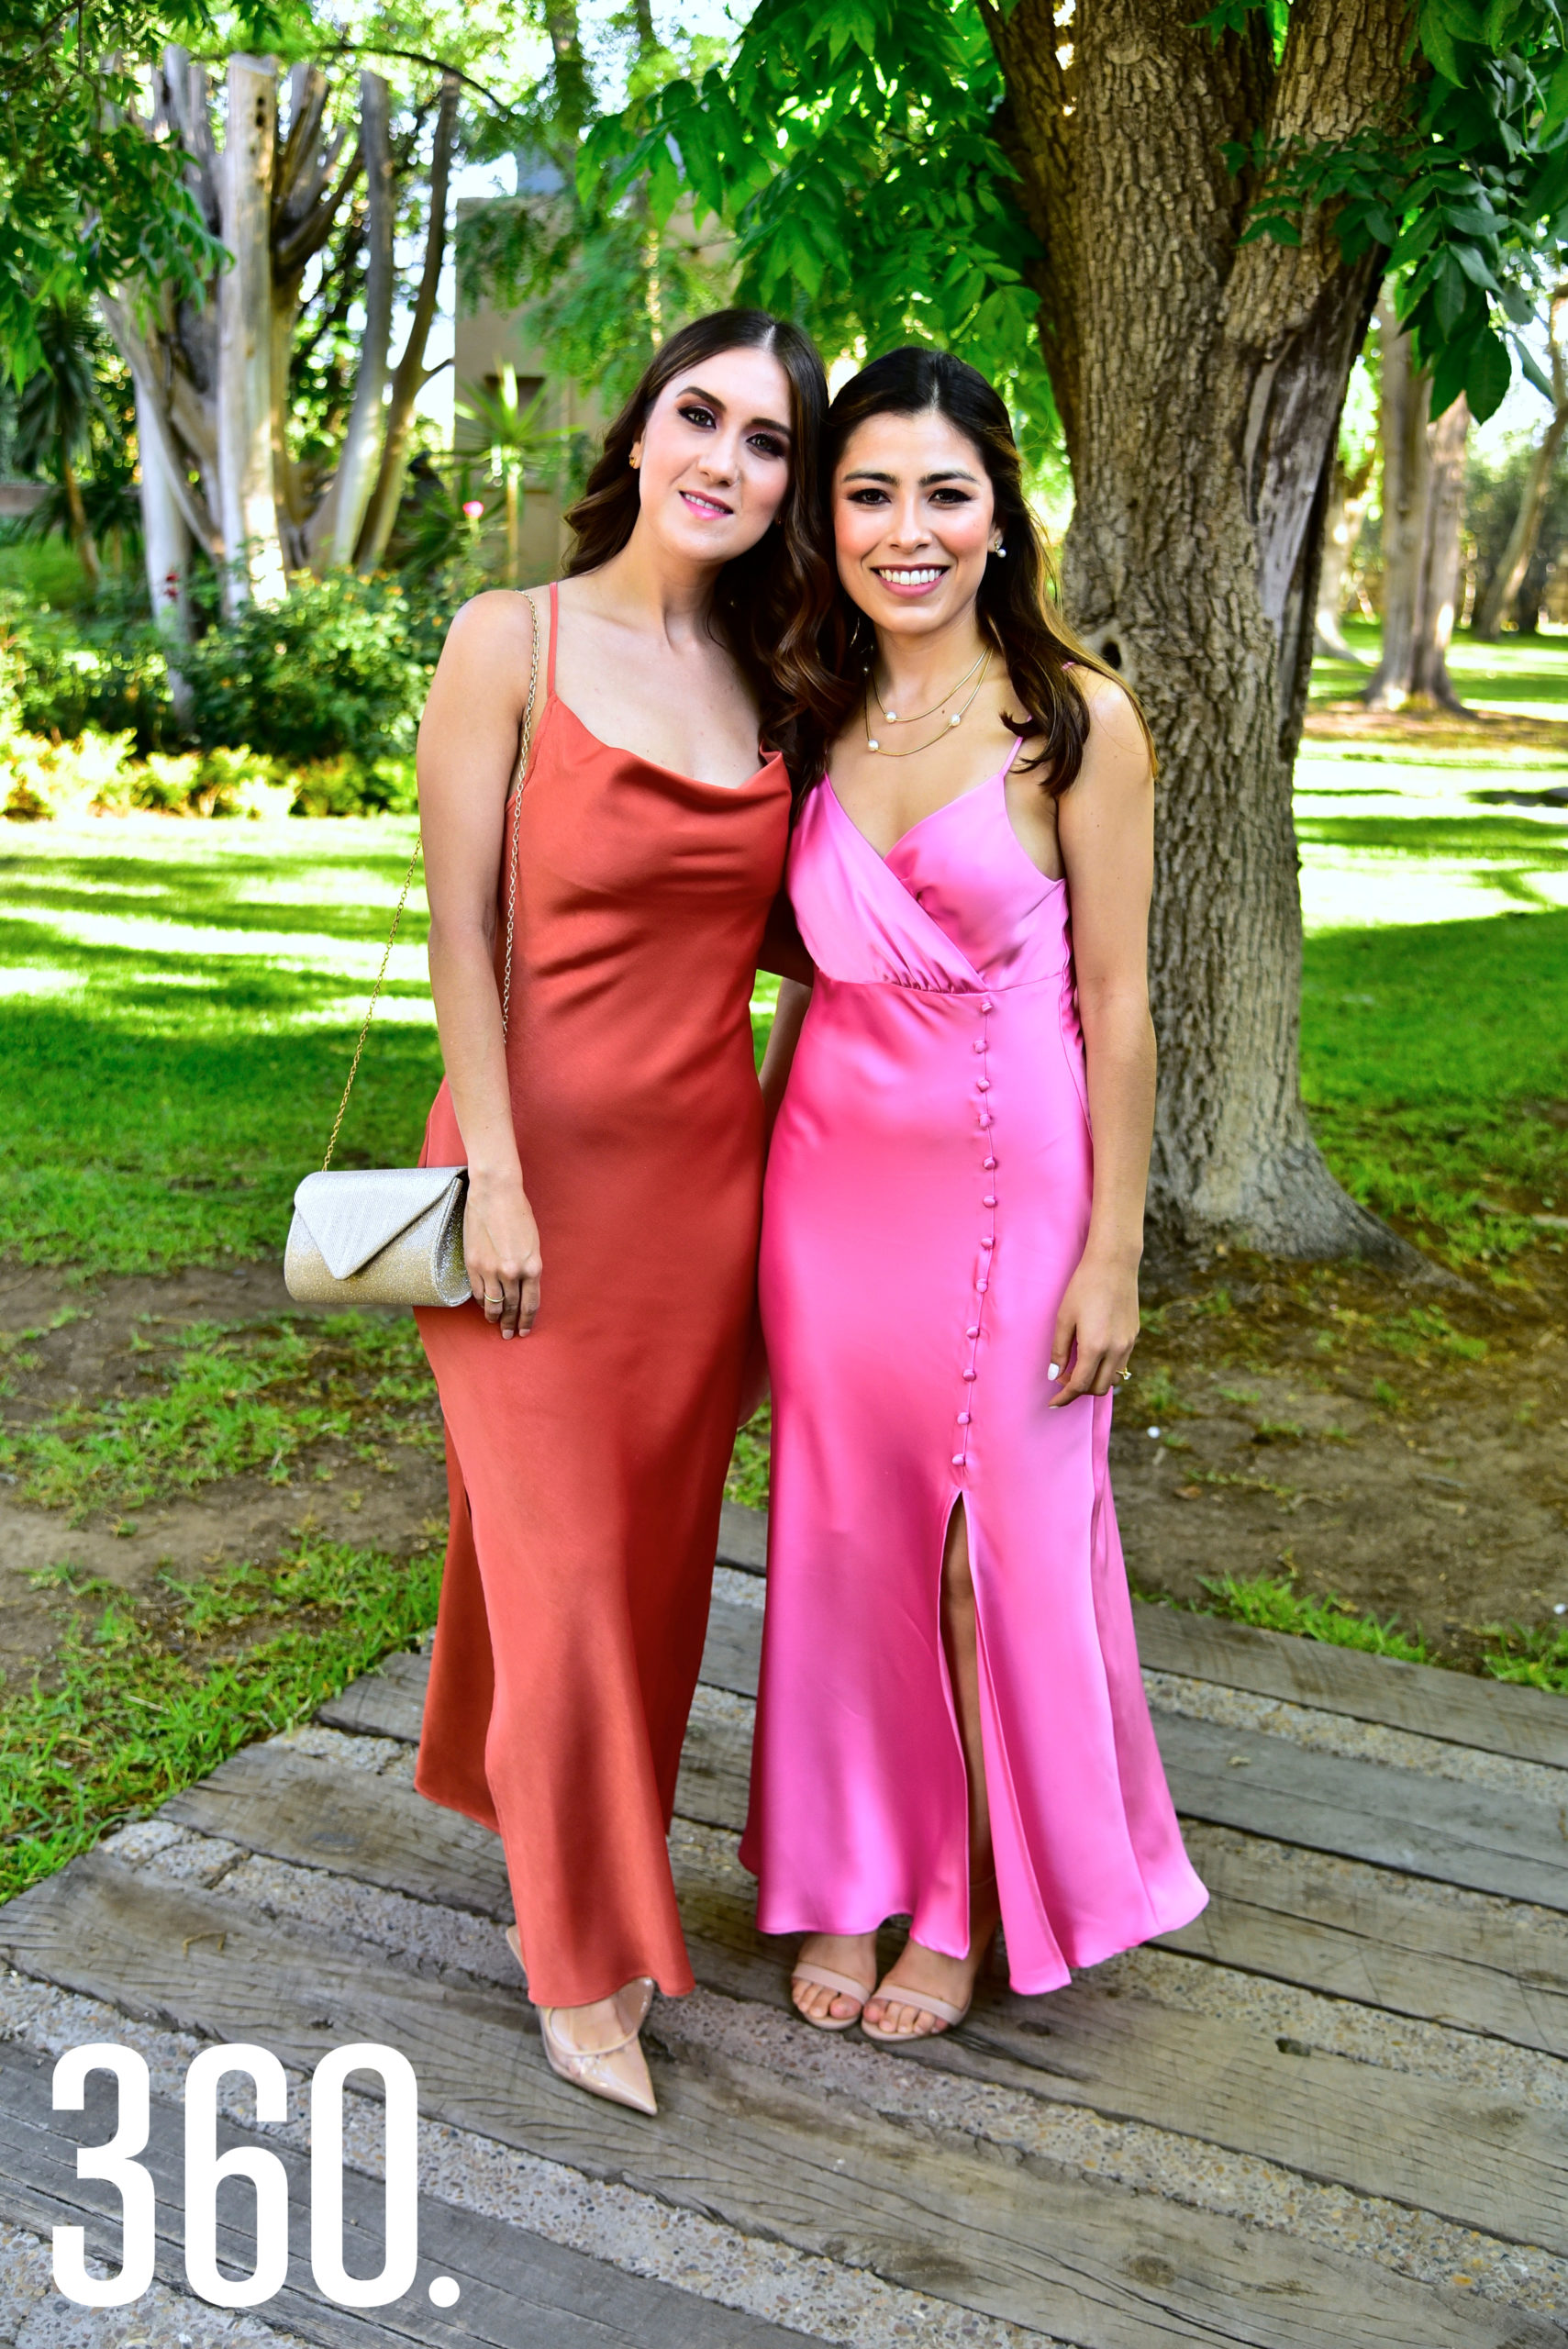 Marifer Garza y Ana Yamamoto.